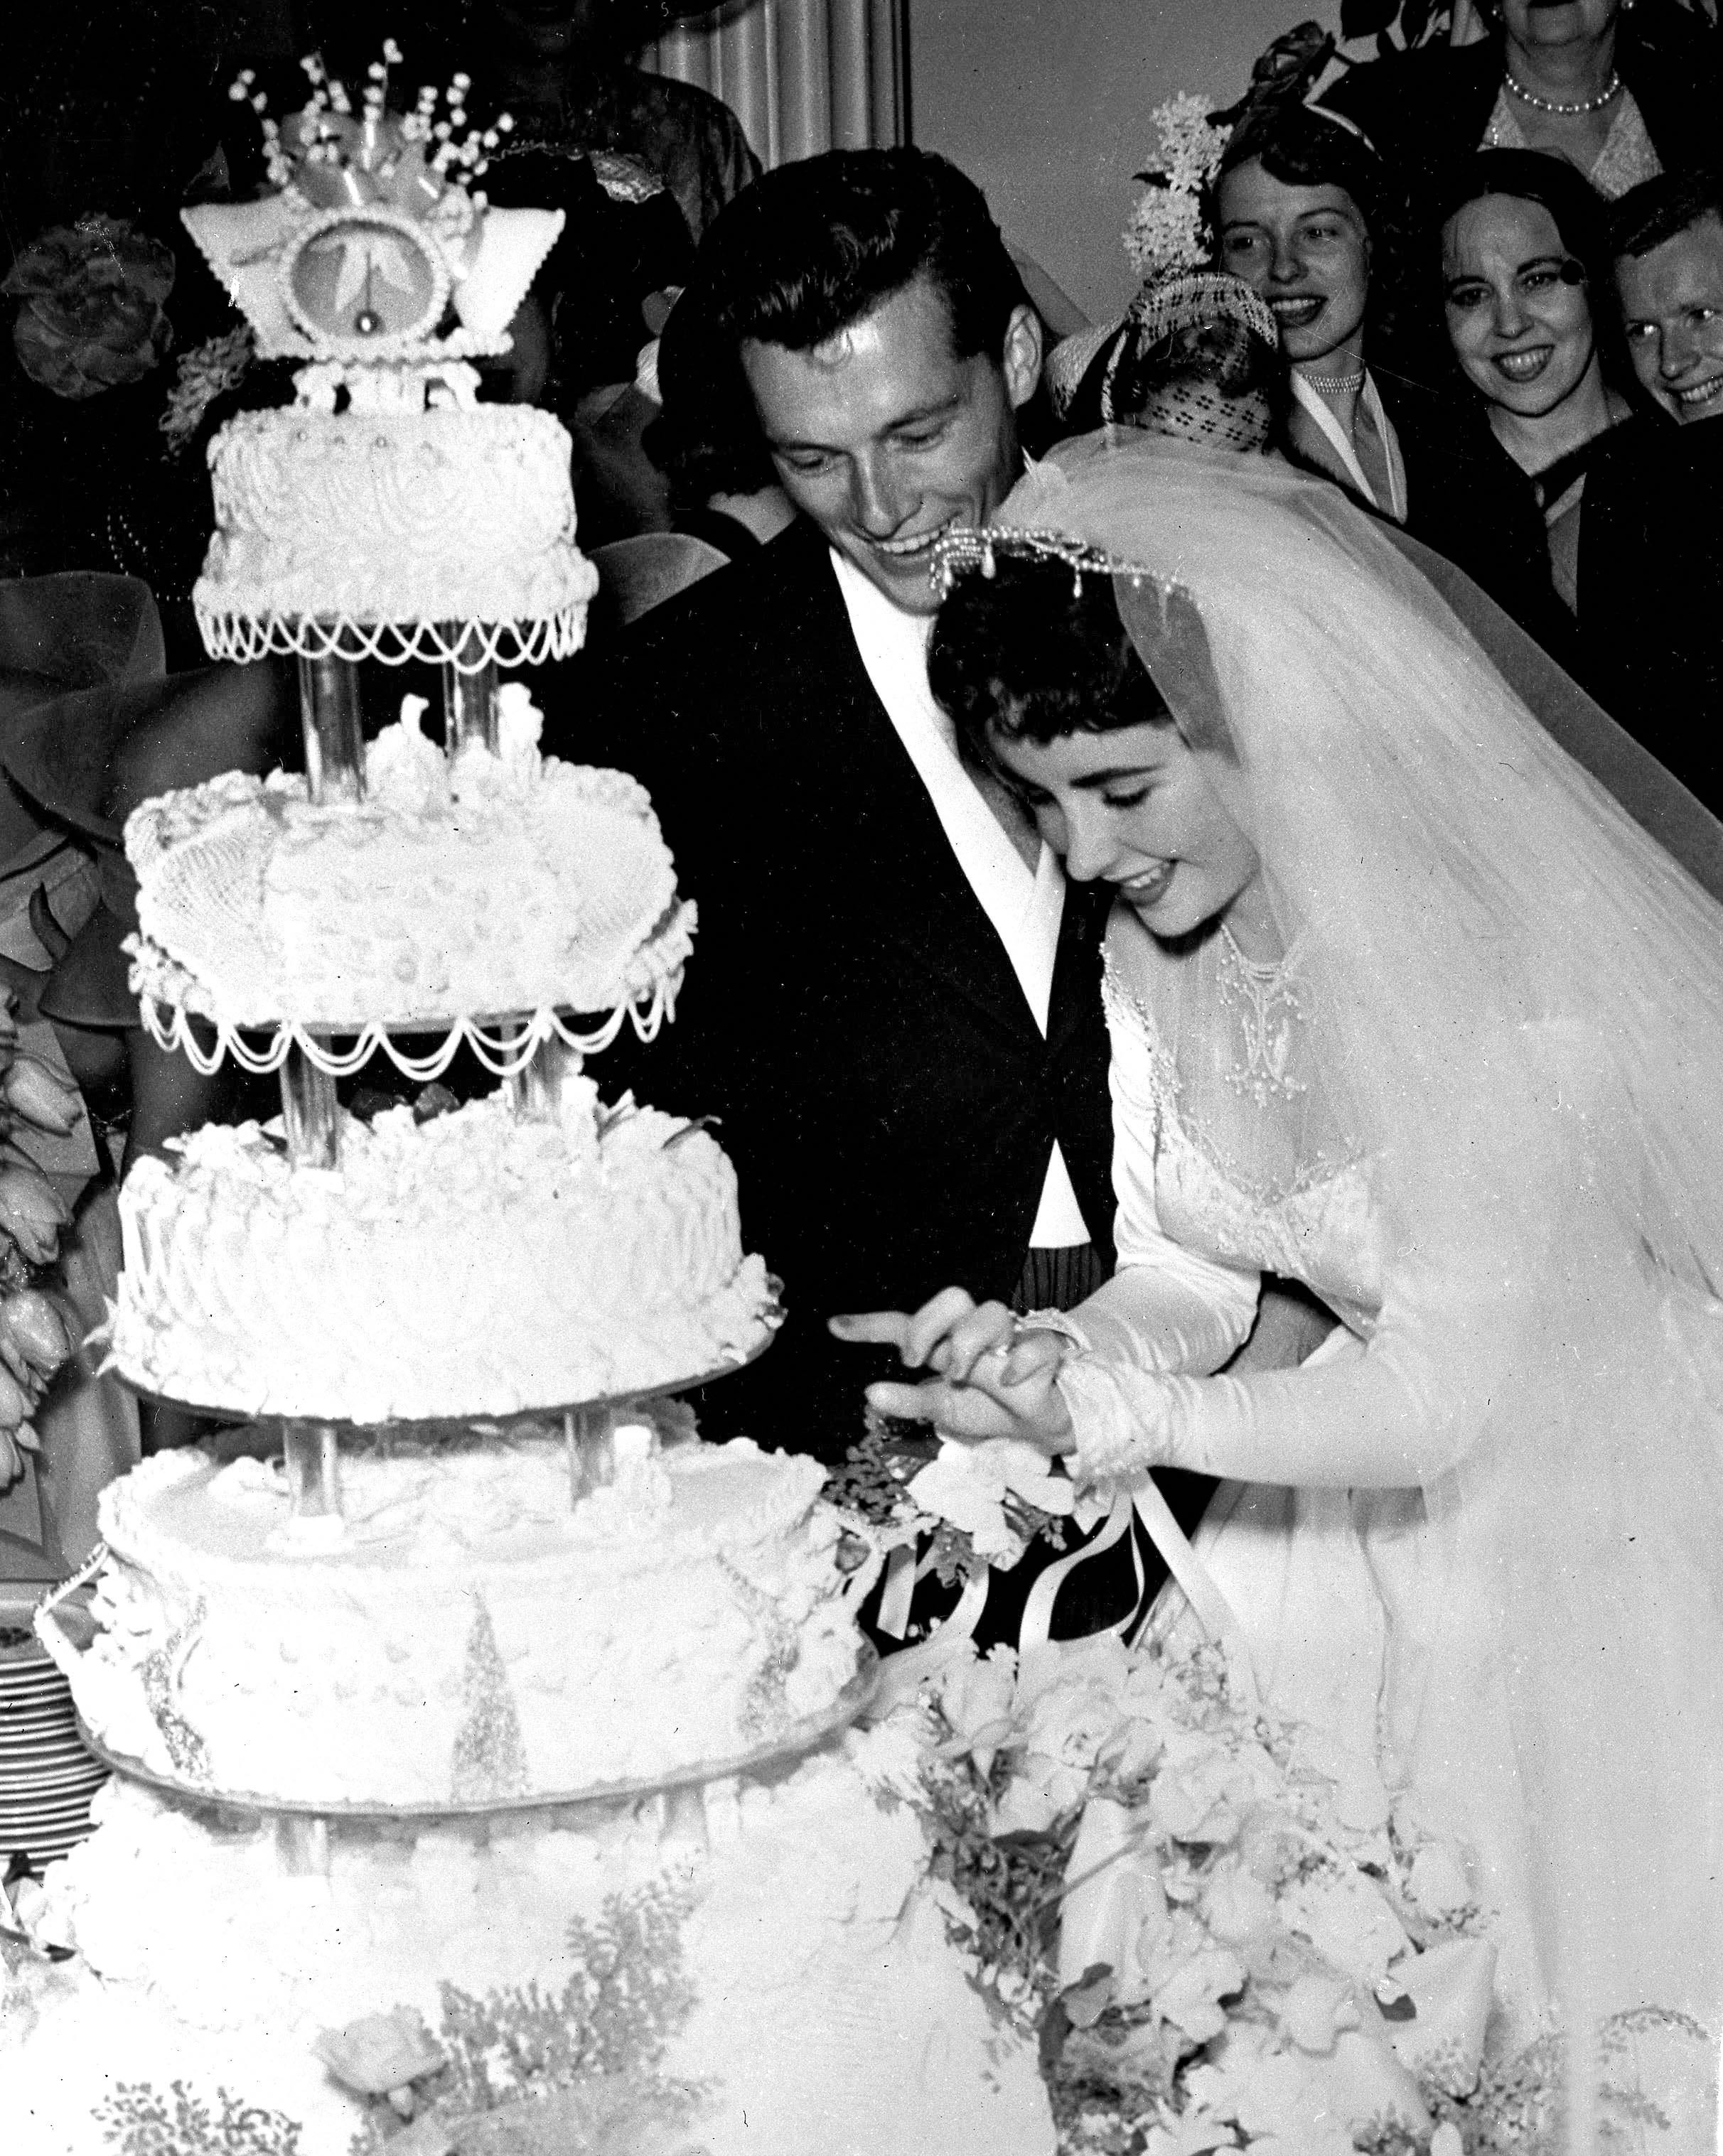 celebrity-vintage-wedding-cakes-liz-taylor-79666956-1015.jpg